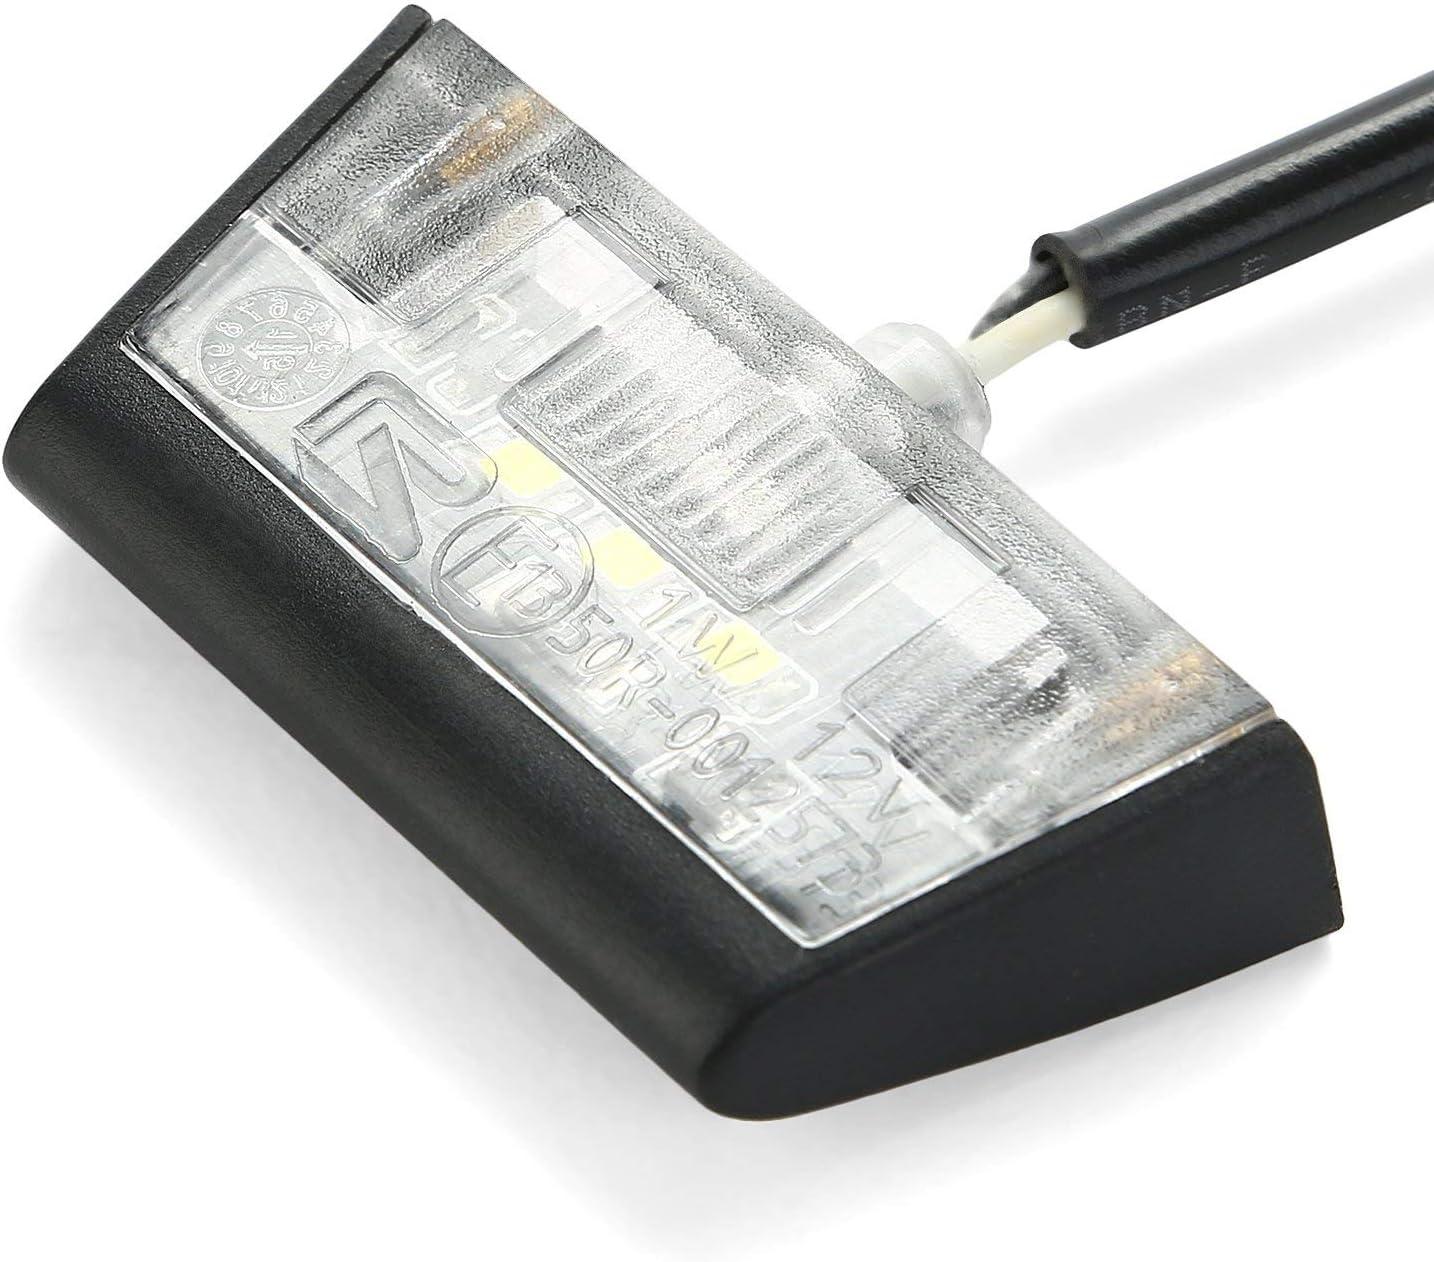 Cicmod Motorrad Mini Led Kennzeichenbeleuchtung Nummernschildbeleuchtung License Plate Tail Light Auto